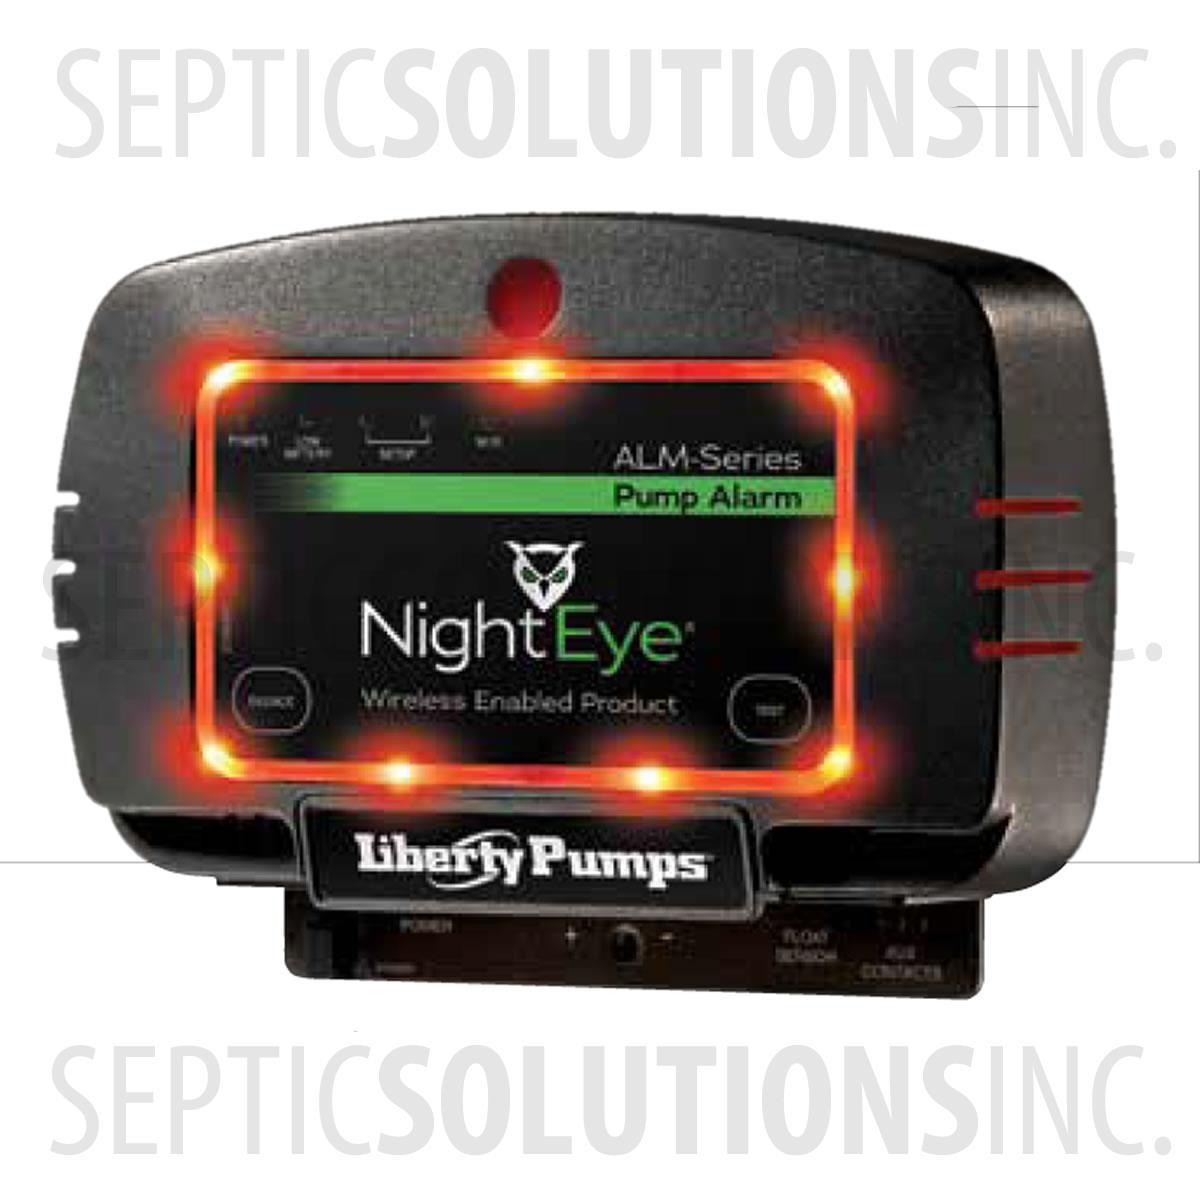 Liberty Pumps Nighteye Wireless Enabled Alarm Alm 2 Eye